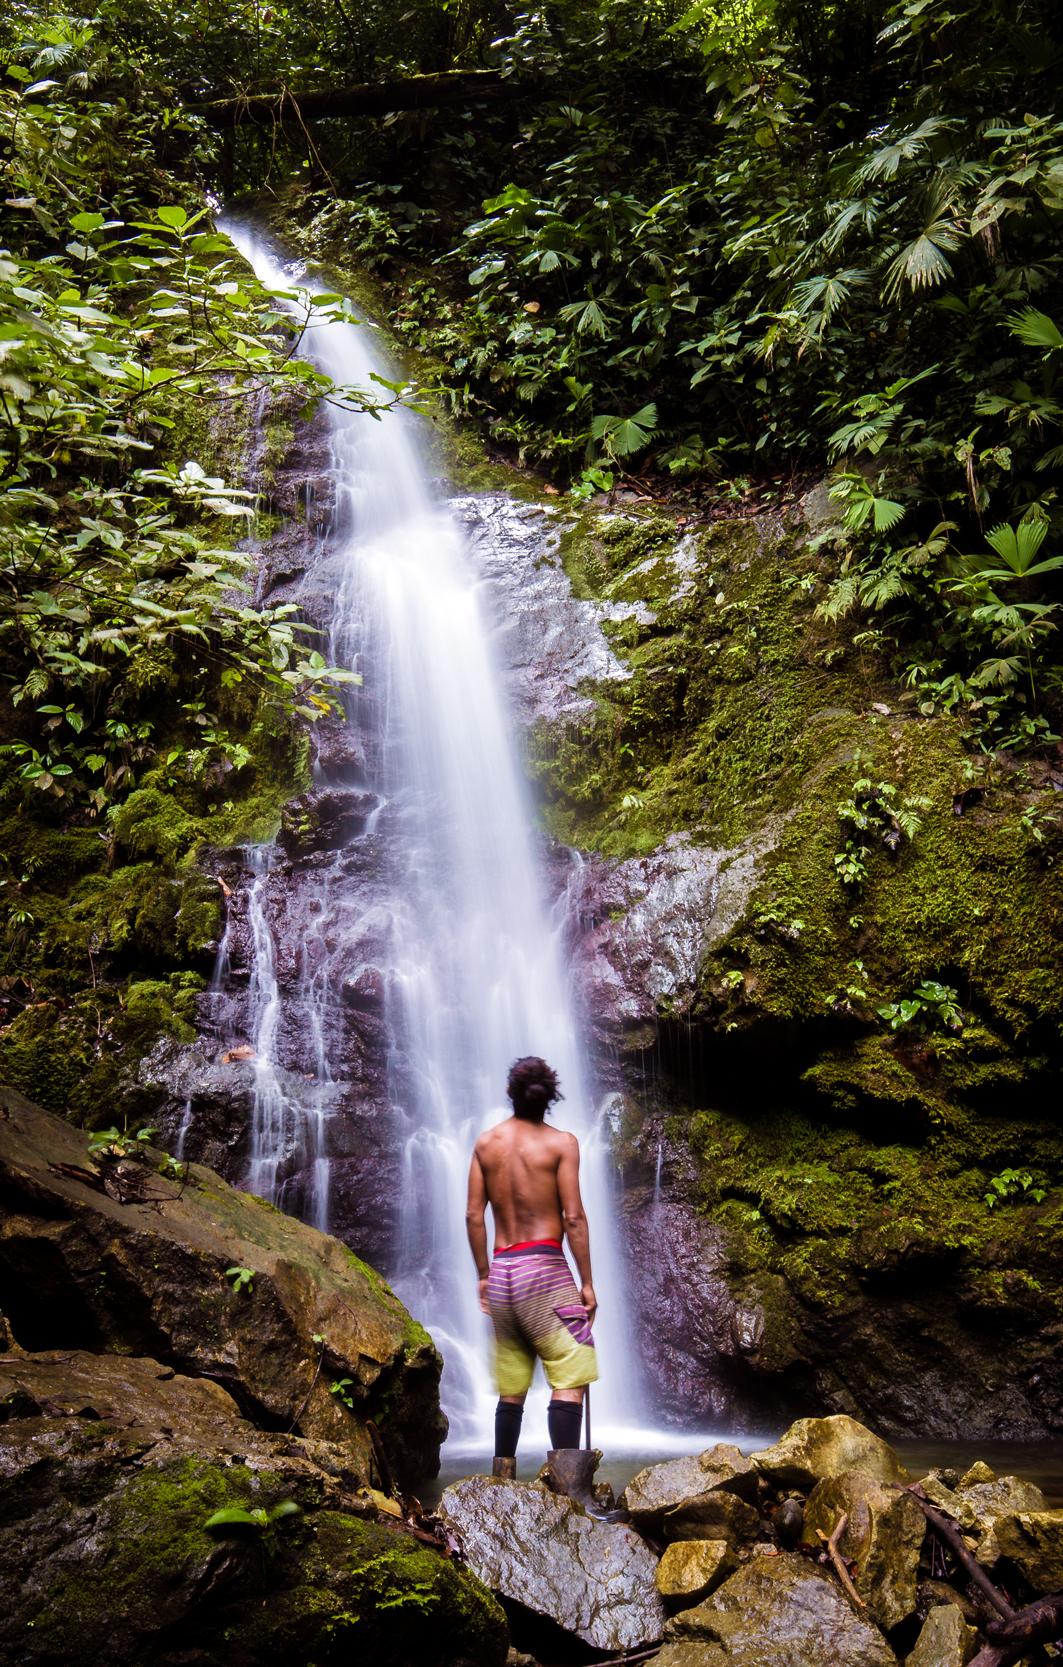 Joaquin at the Waterfall